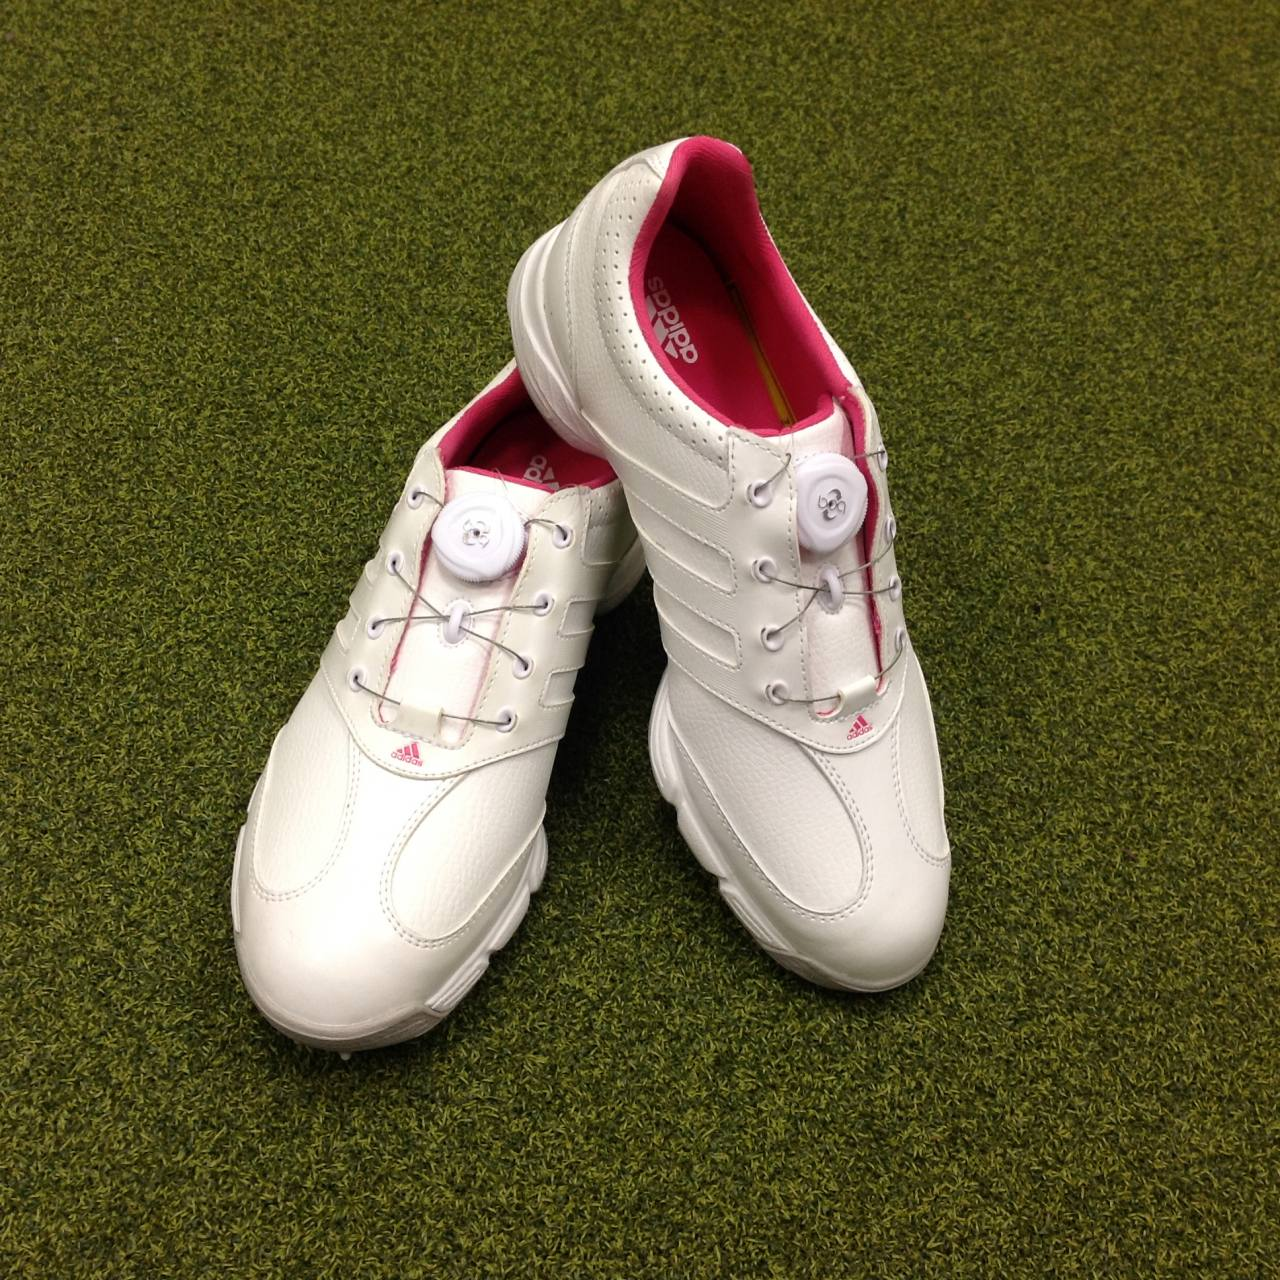 Details about NEW Ladies Adidas Response Boa Golf Shoes - UK Size 5.5 - US 7.5 - EU 38